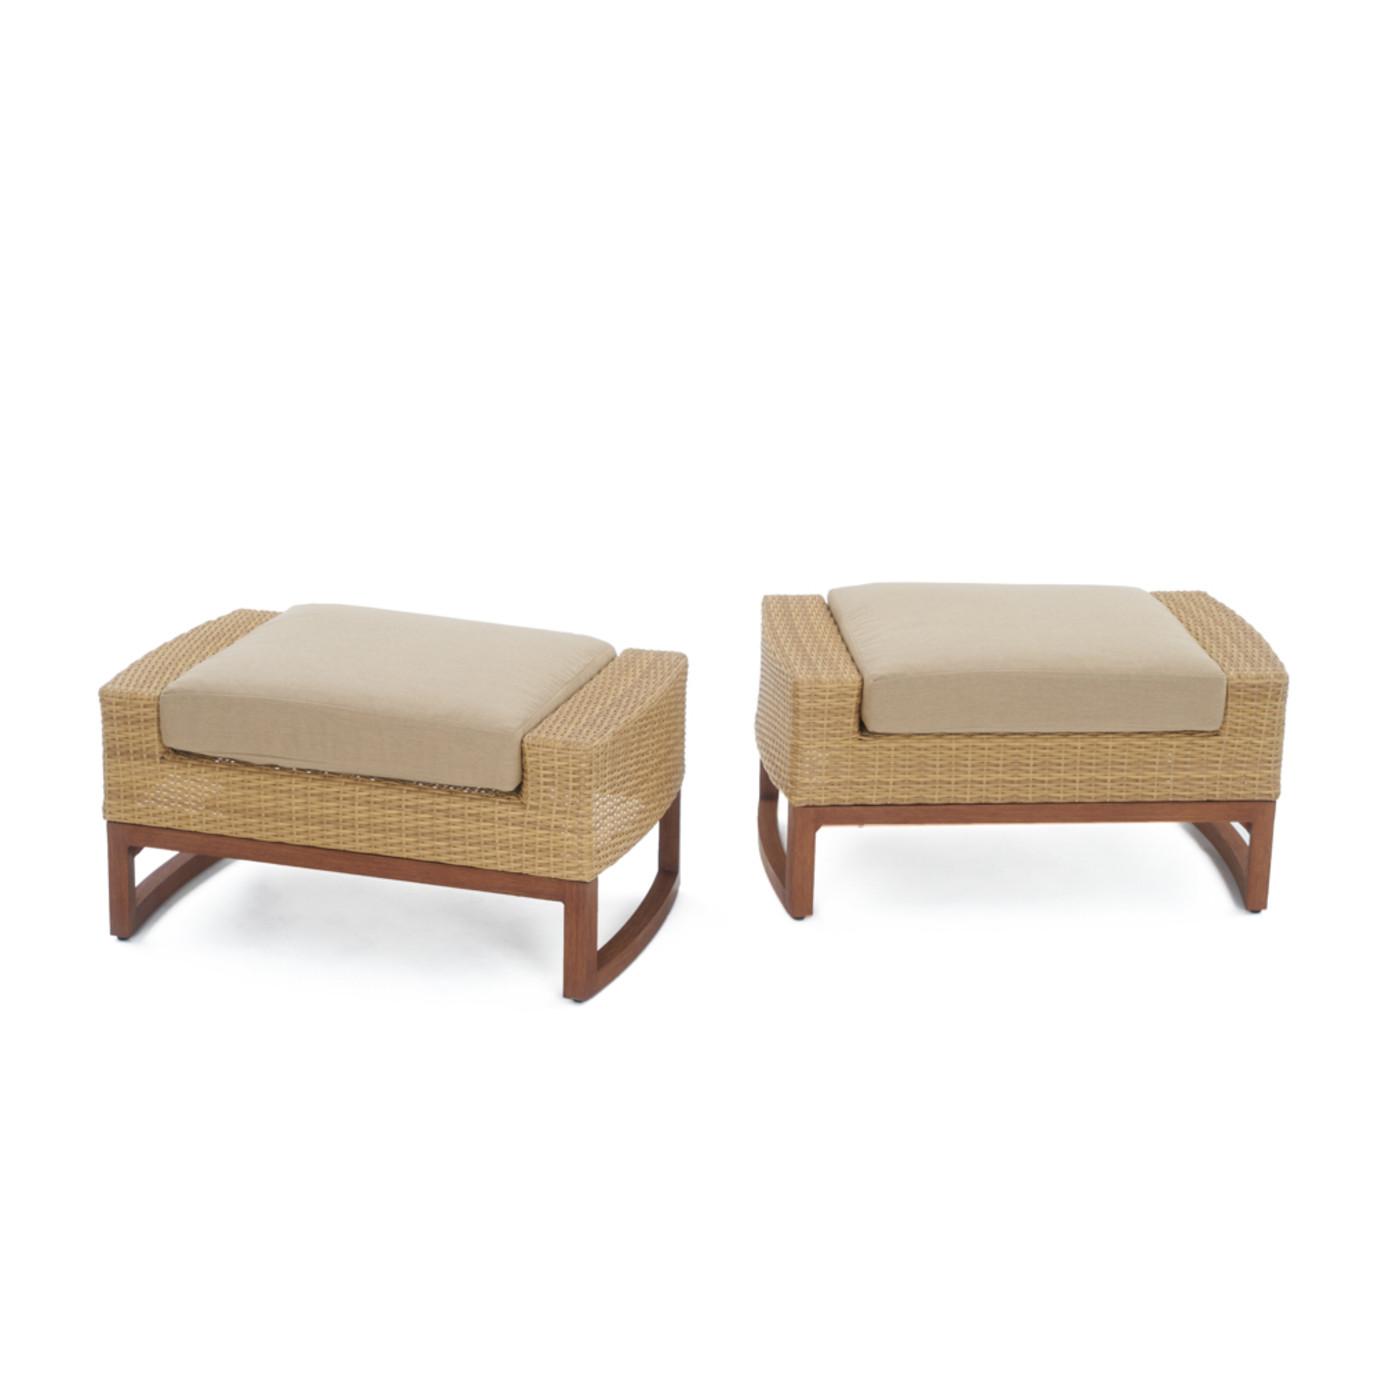 Milea™ 5pc Club Chair & Ottoman Set - Maxim Beige